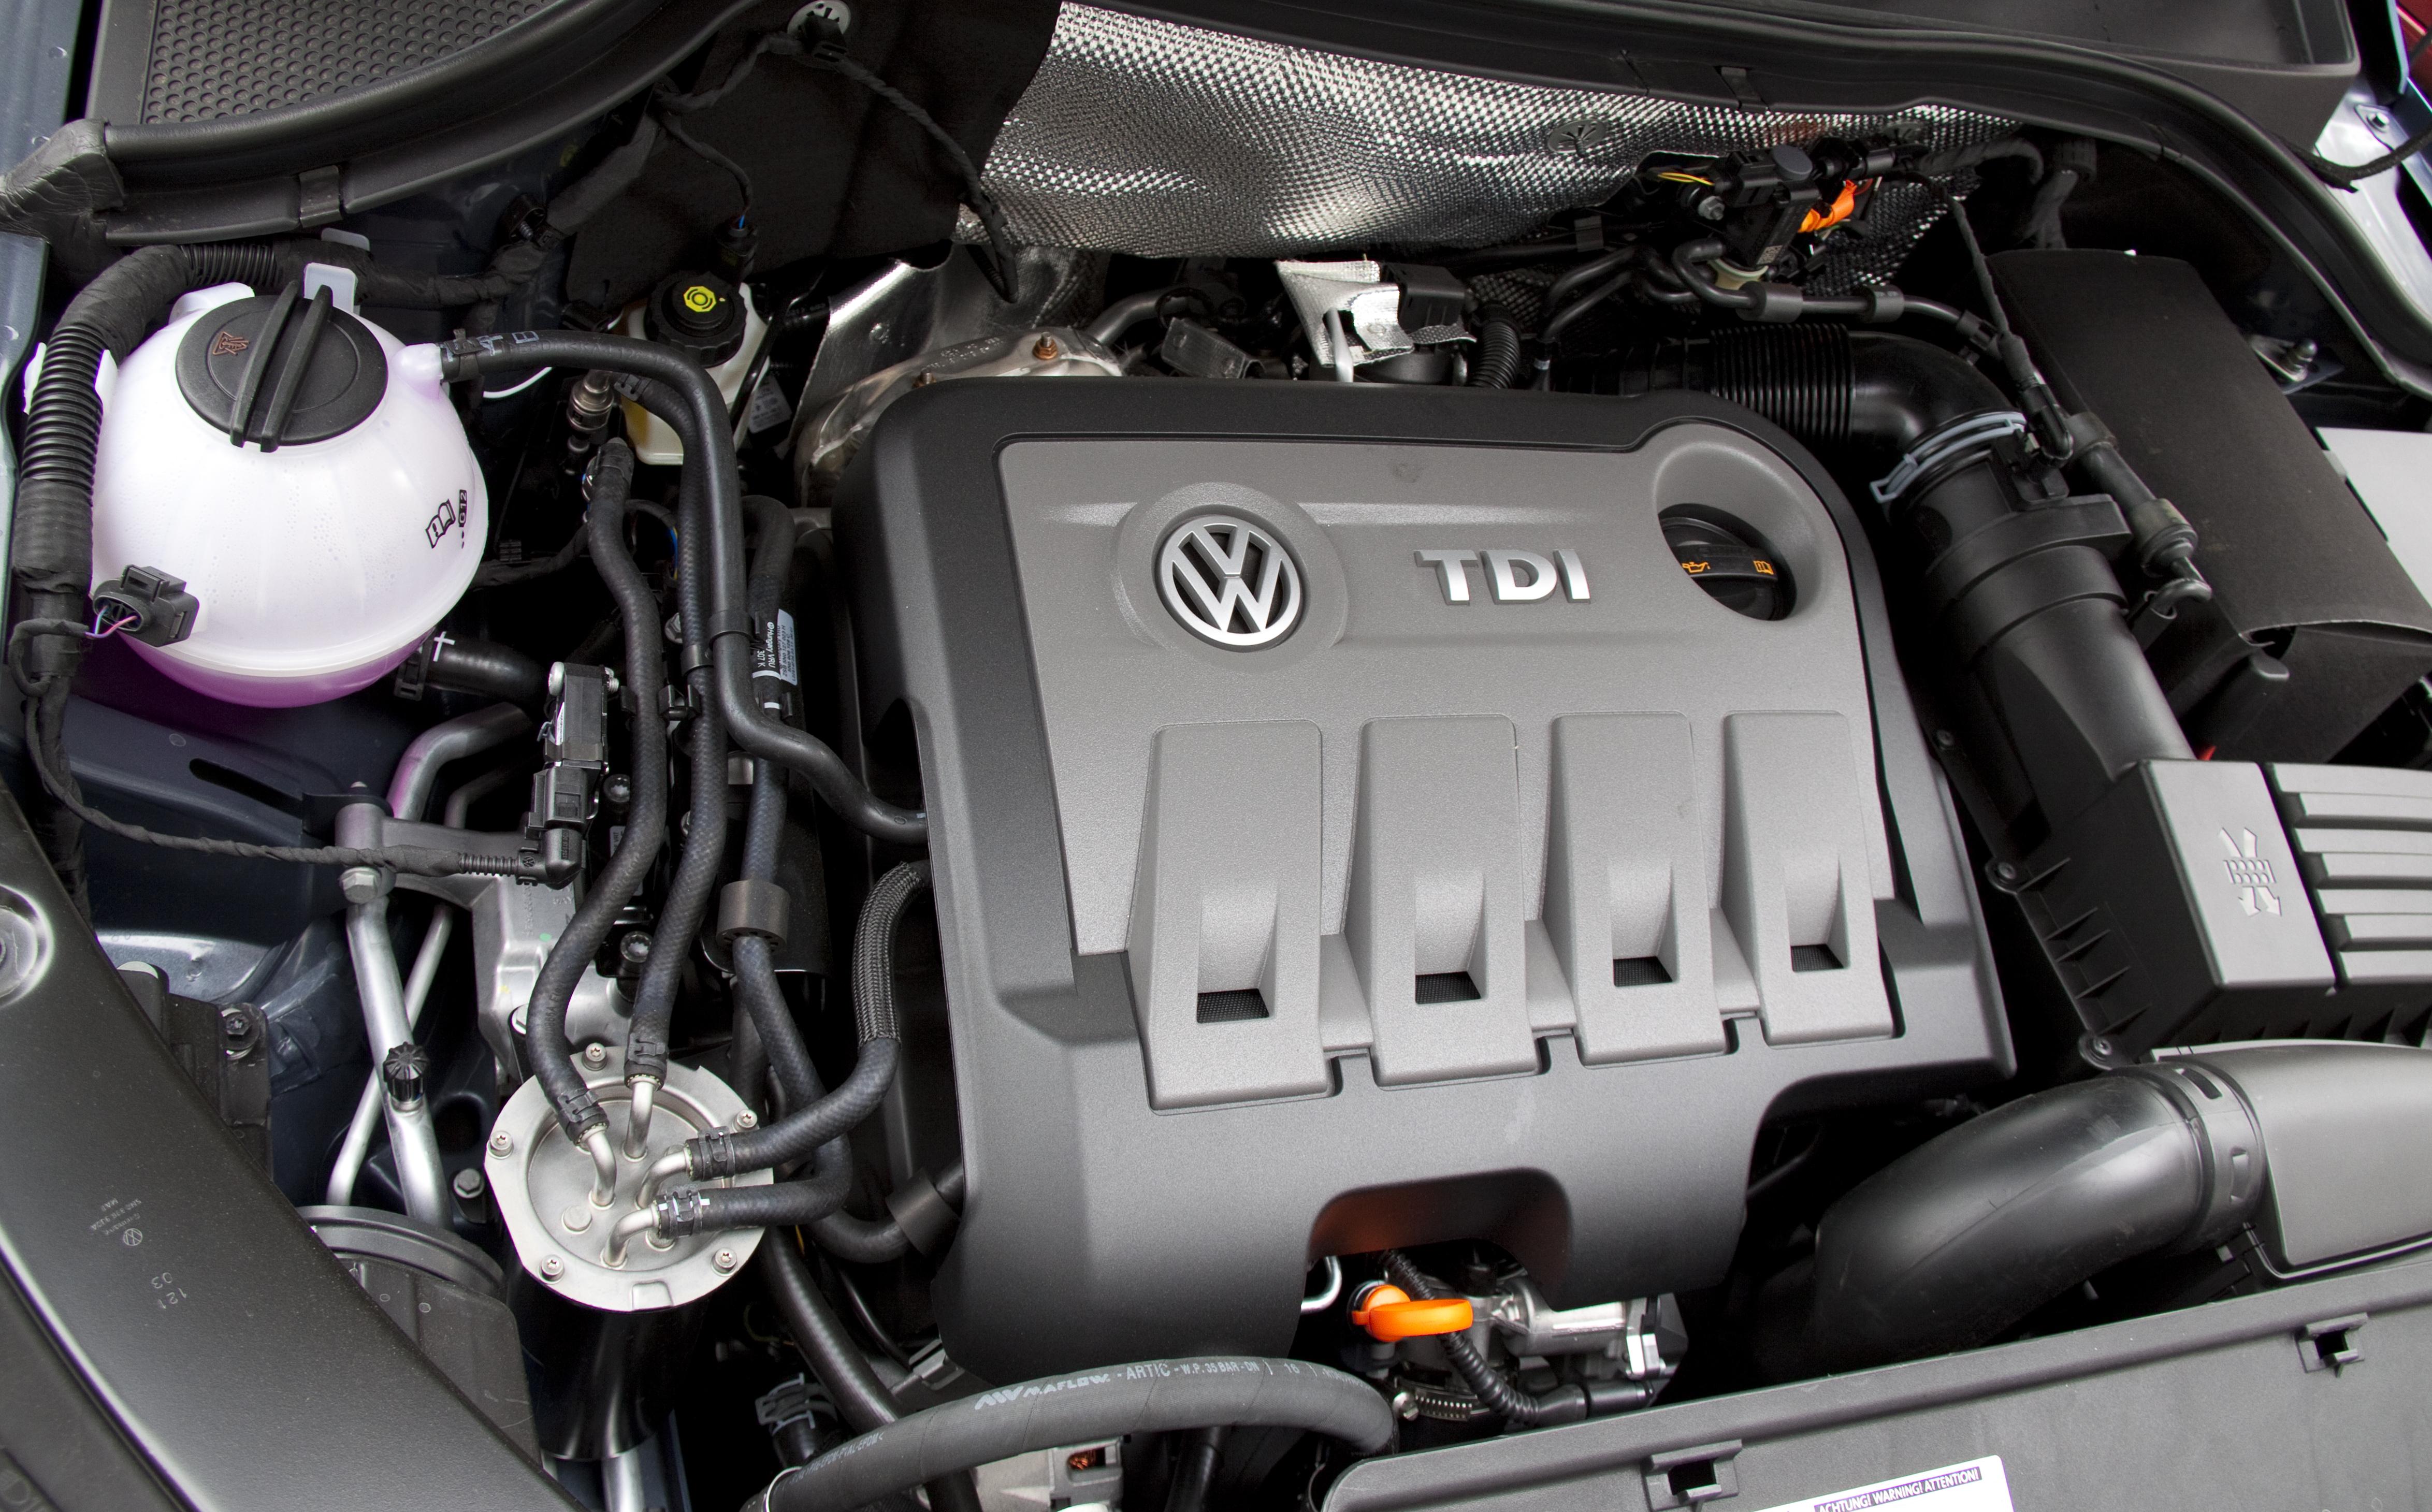 VW Emissions Scandal Echoes GM India Controversy | WardsAuto